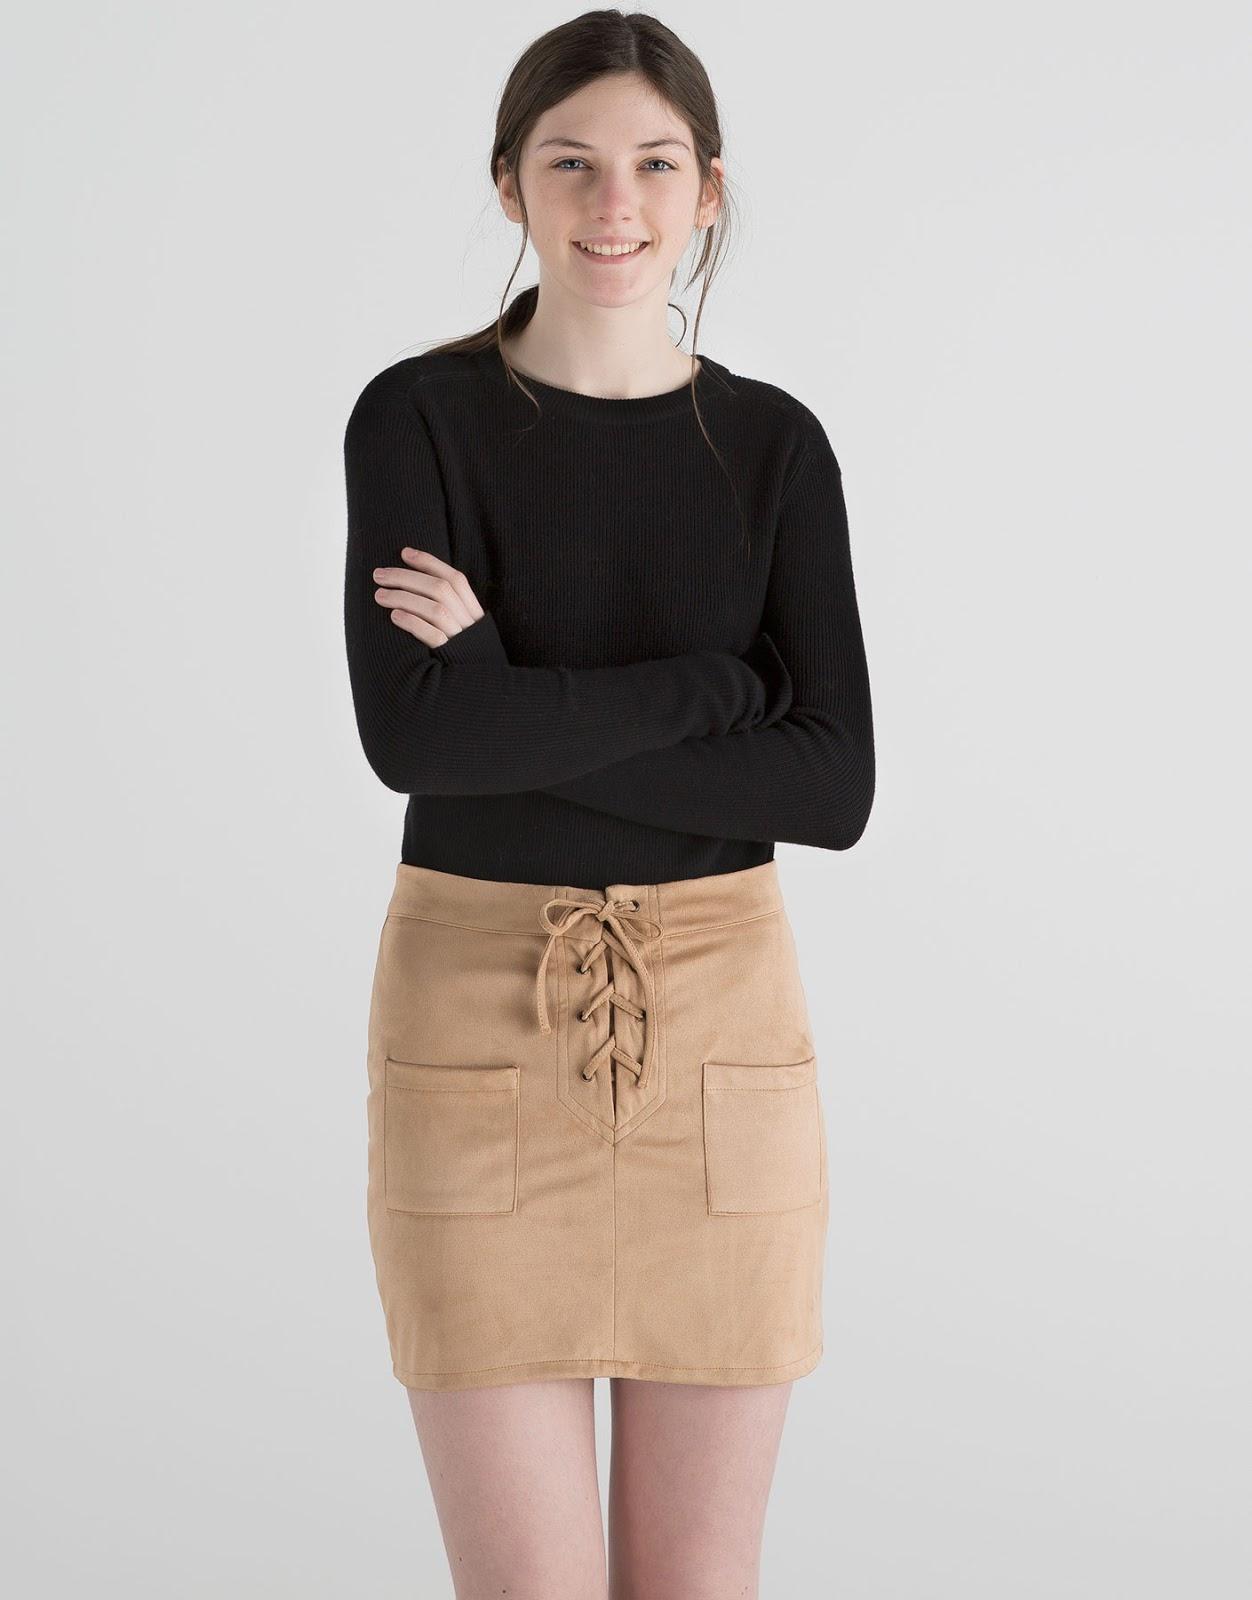 Model Style Rok Pendek Trend Masa Kini 2016